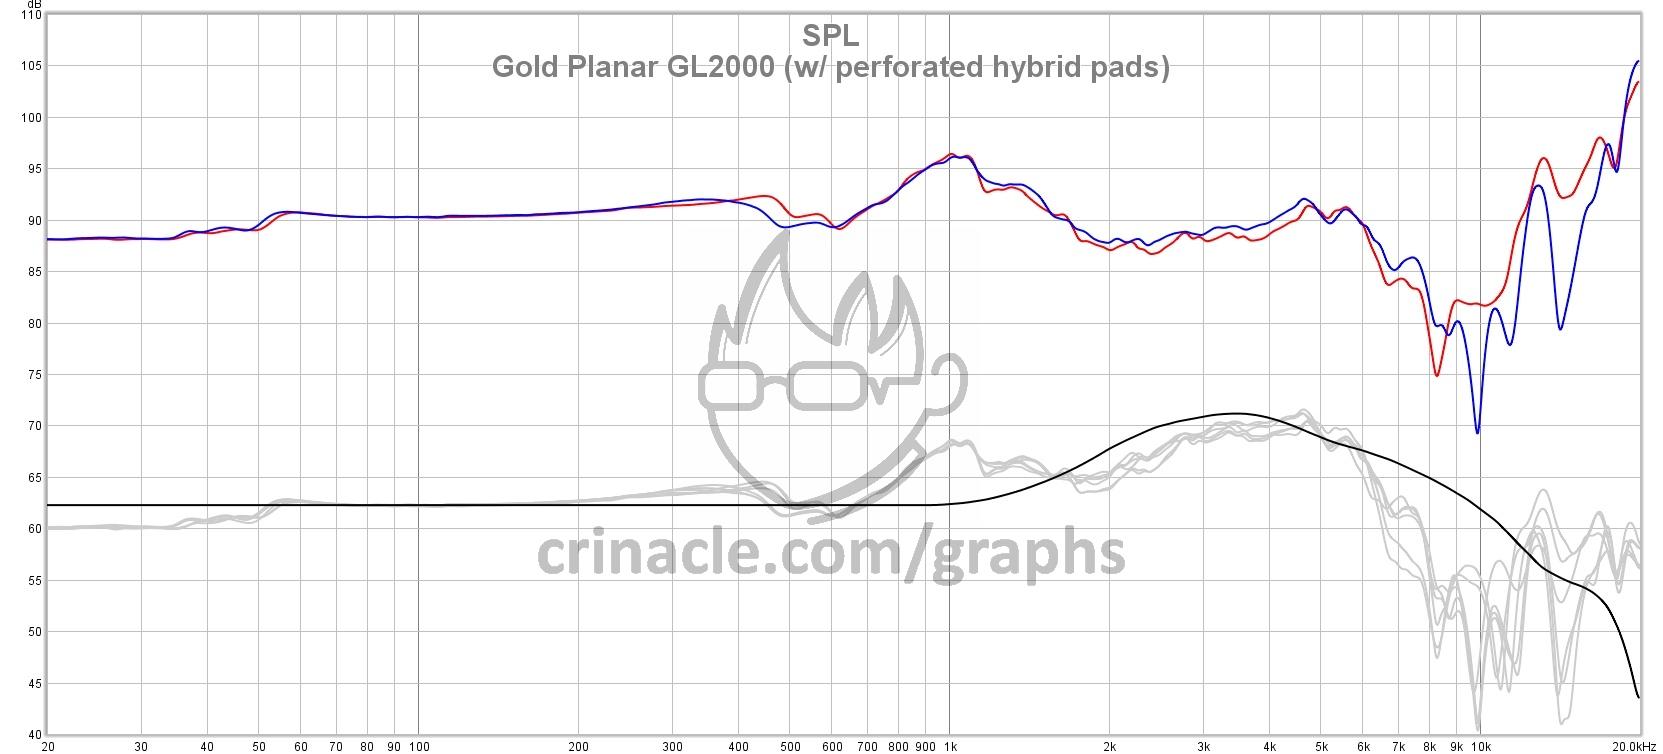 Gold Planar GL2000 double magnet version GL2000-perf-hybrid